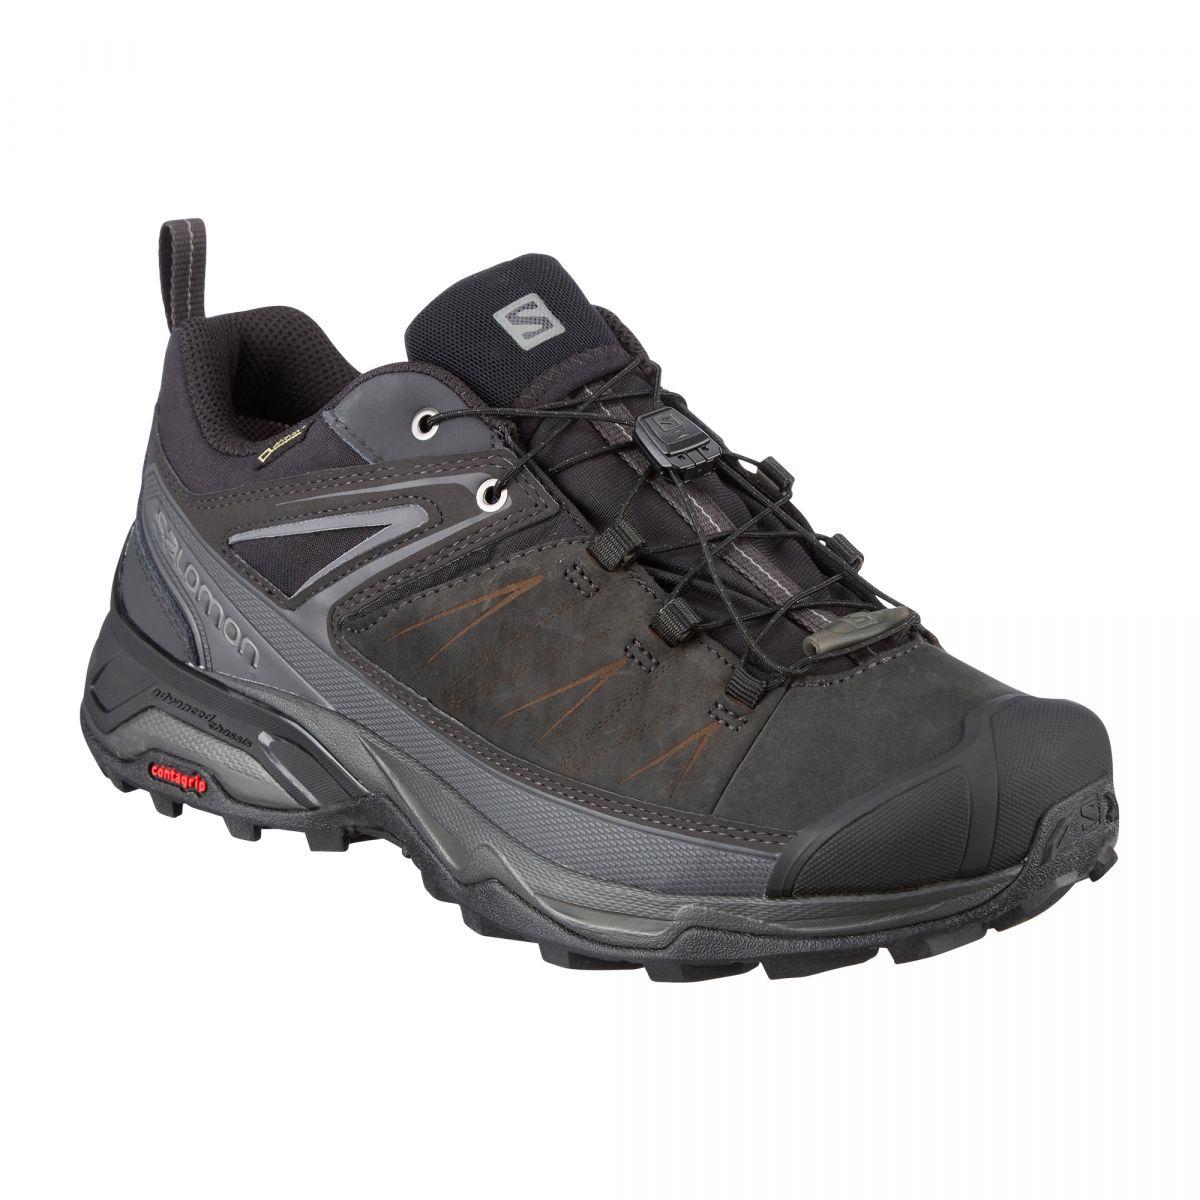 Purchase the Salomon X Ultra 3 LTR GTX Shoe Phantom Magnet by AS 7S84J